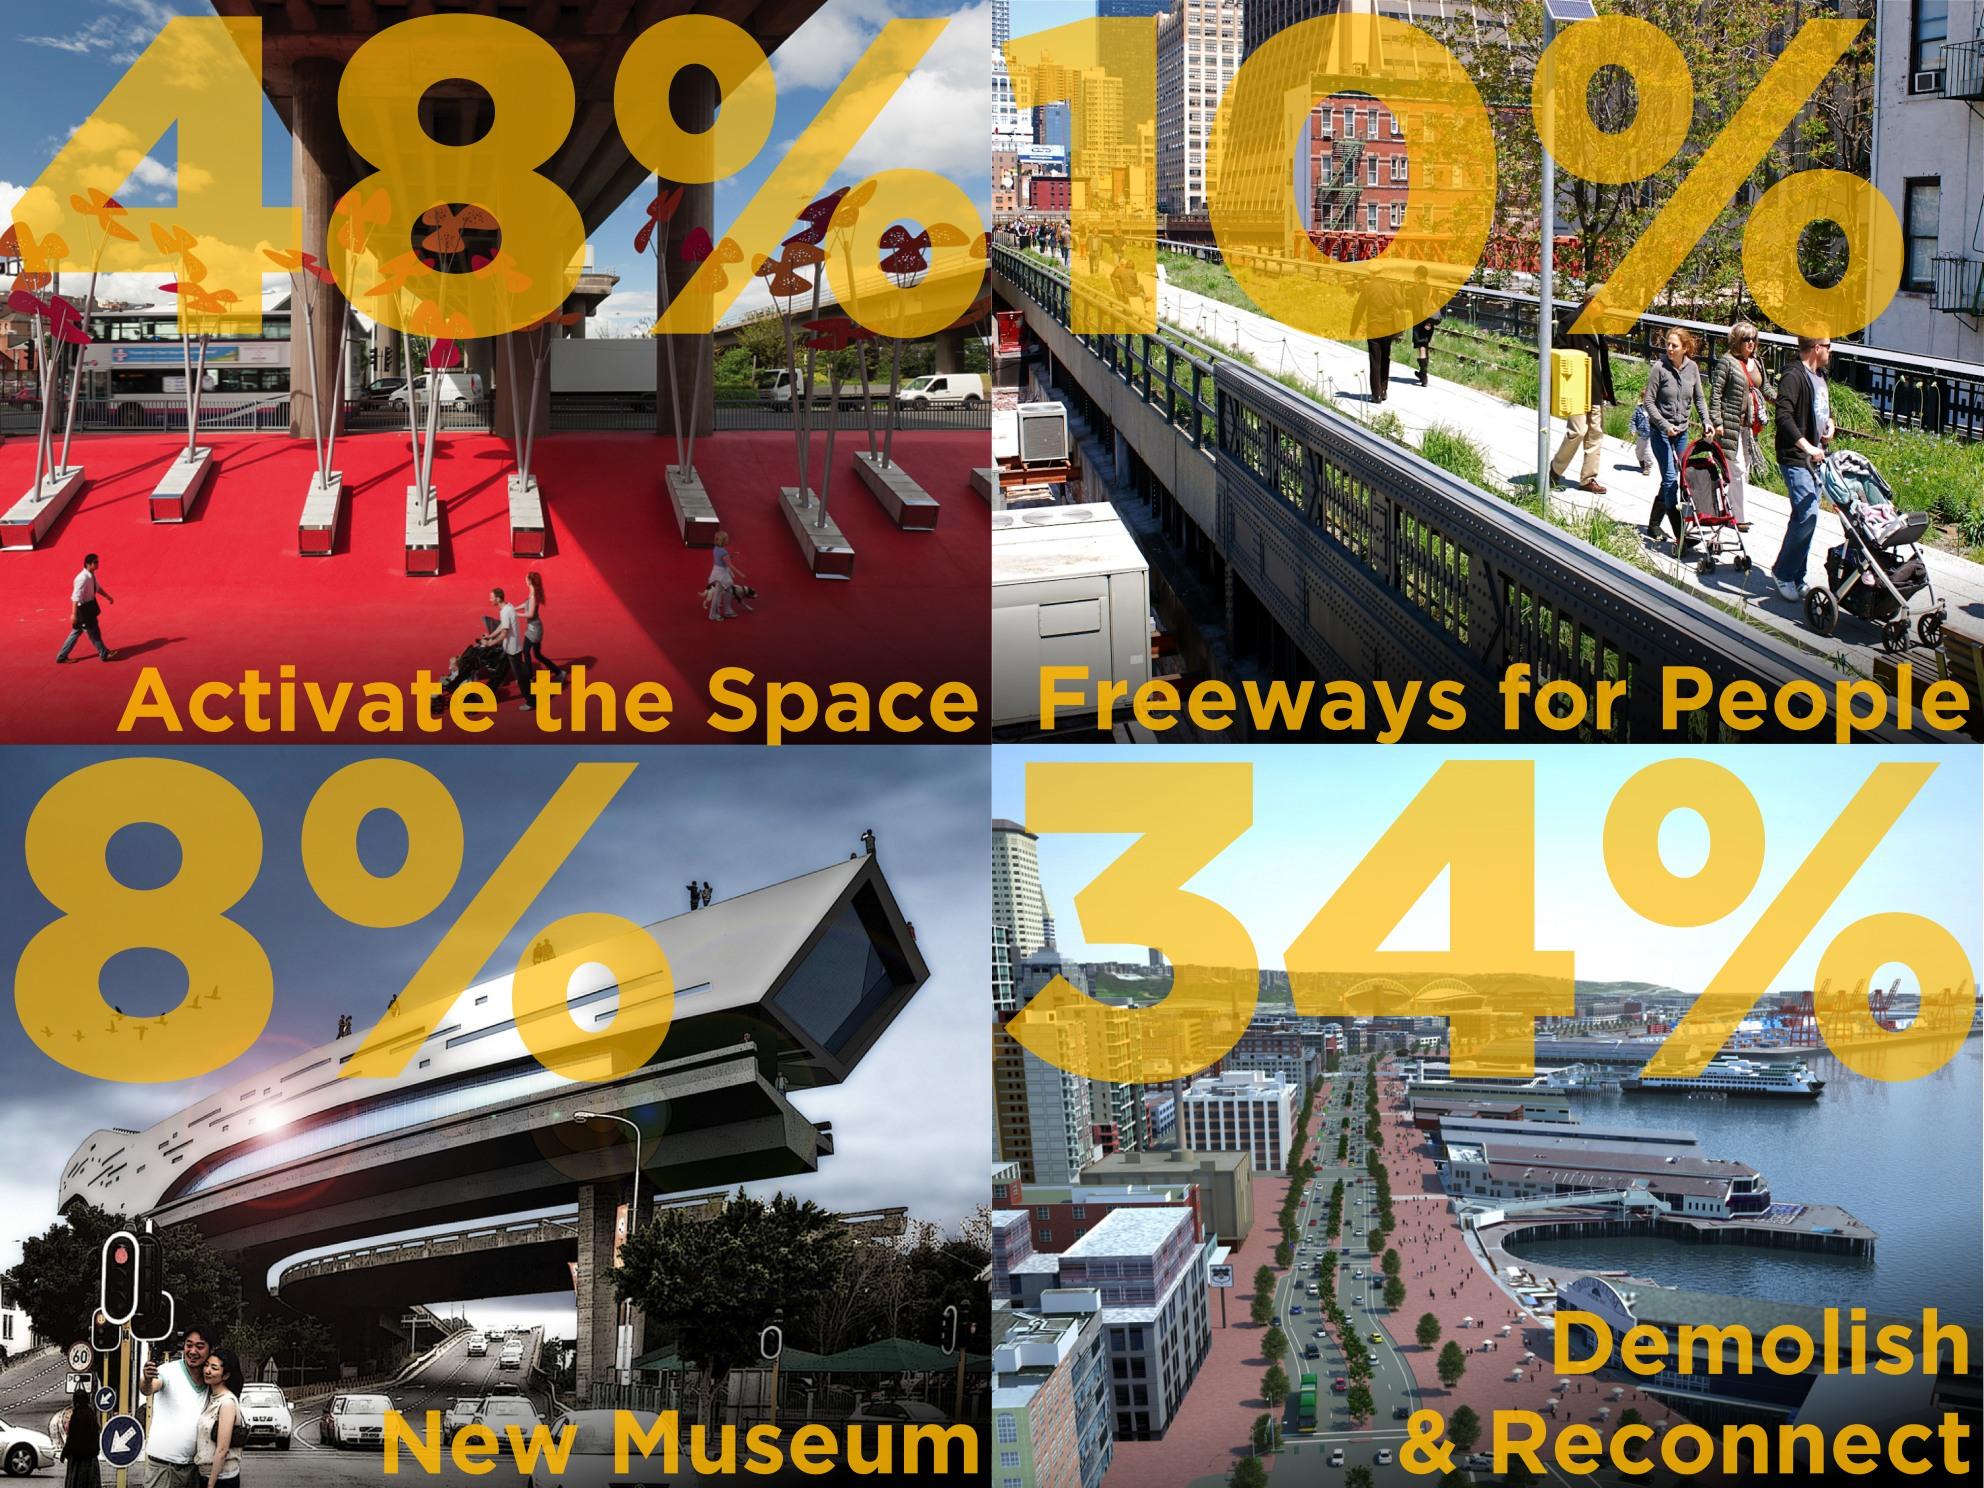 yci-freeway-stats